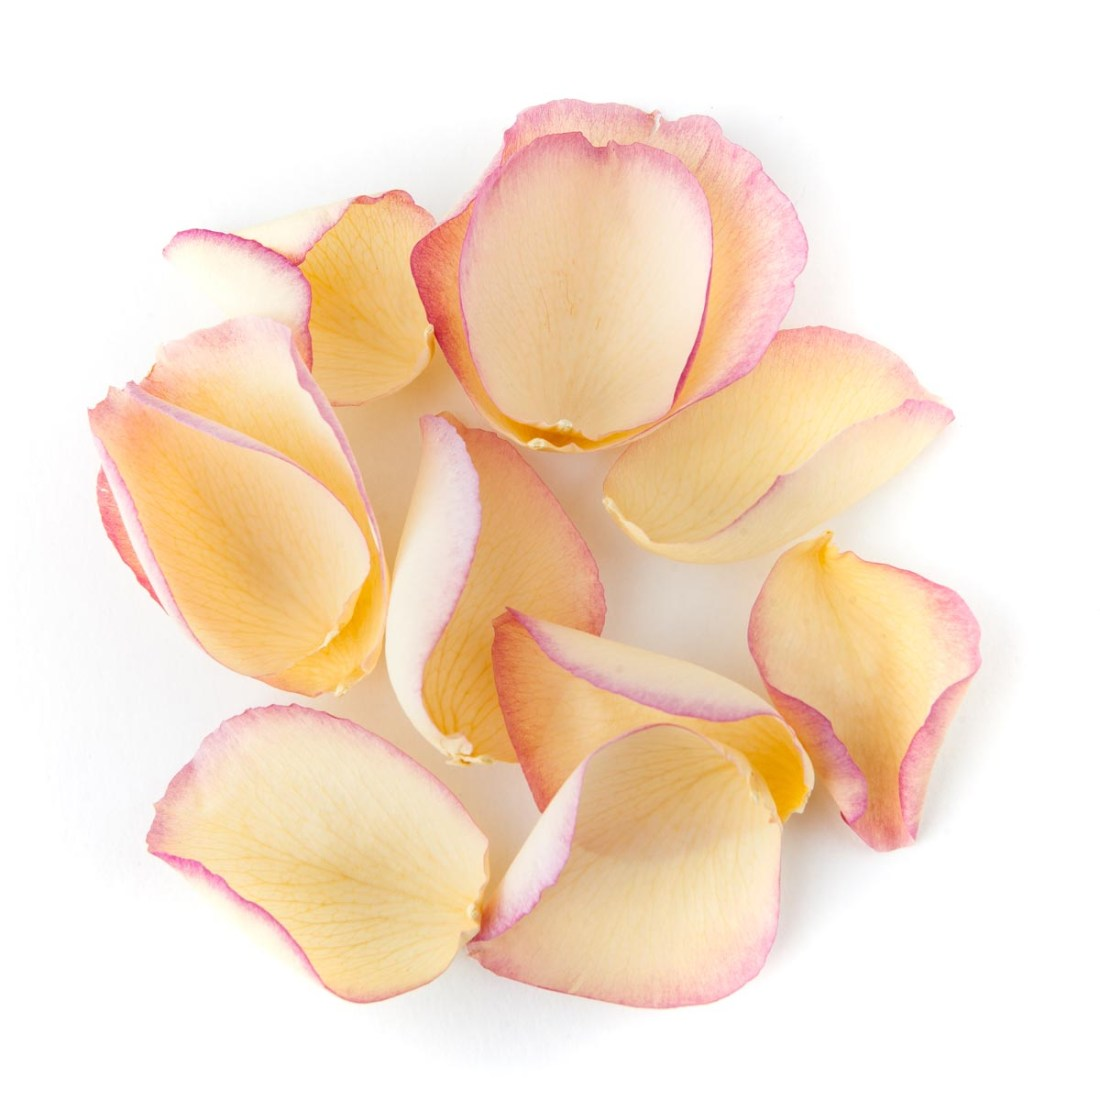 Flower petals - wedding aisles and petal pathways: Pink & Cream Large Natural Rose Petals